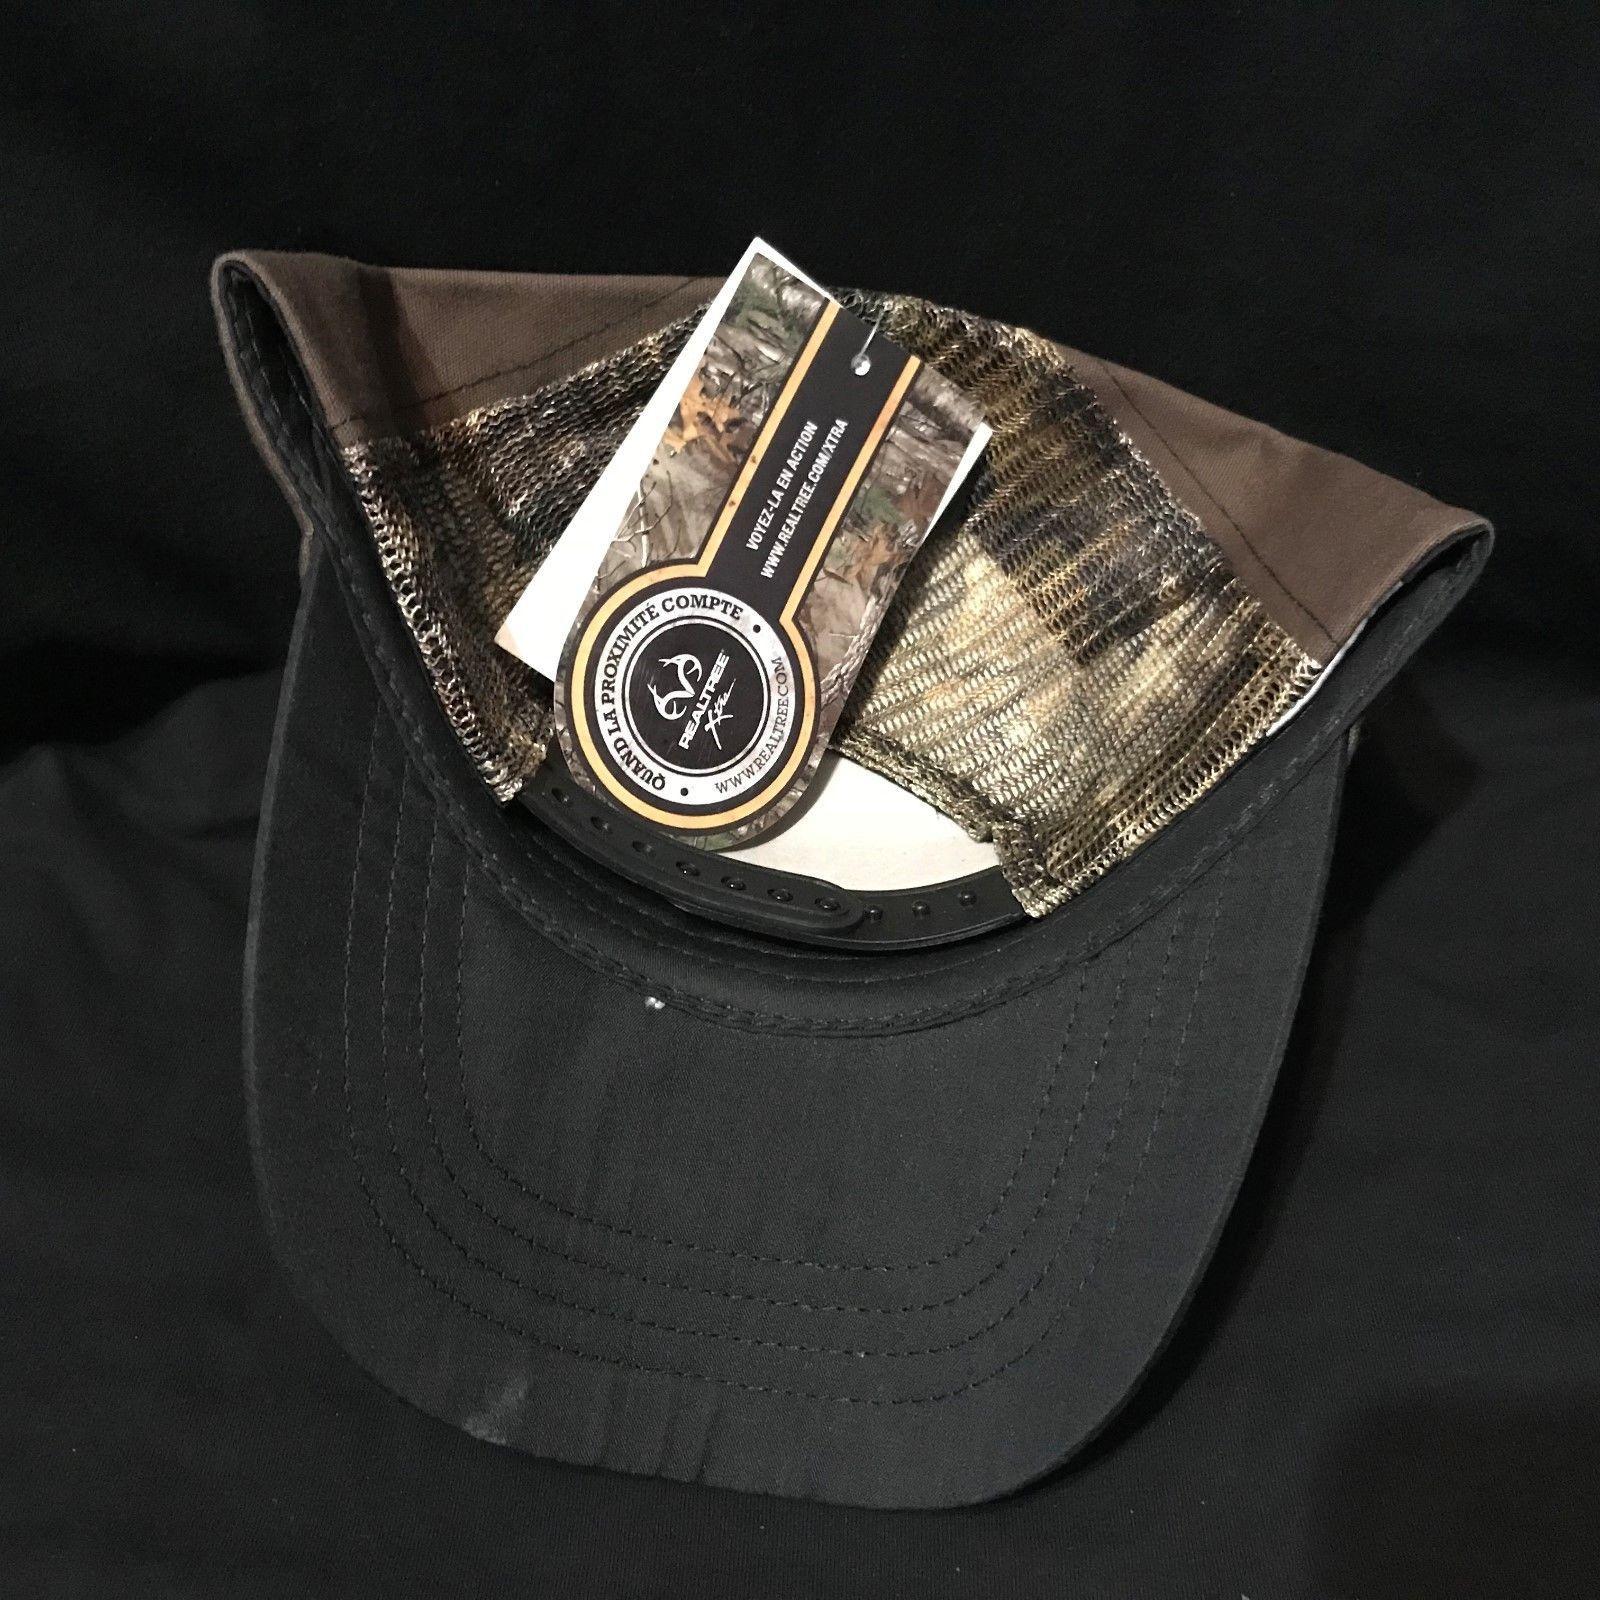 Chevy Trucks Realtree Camo Adjustable trucker baseball cap hat